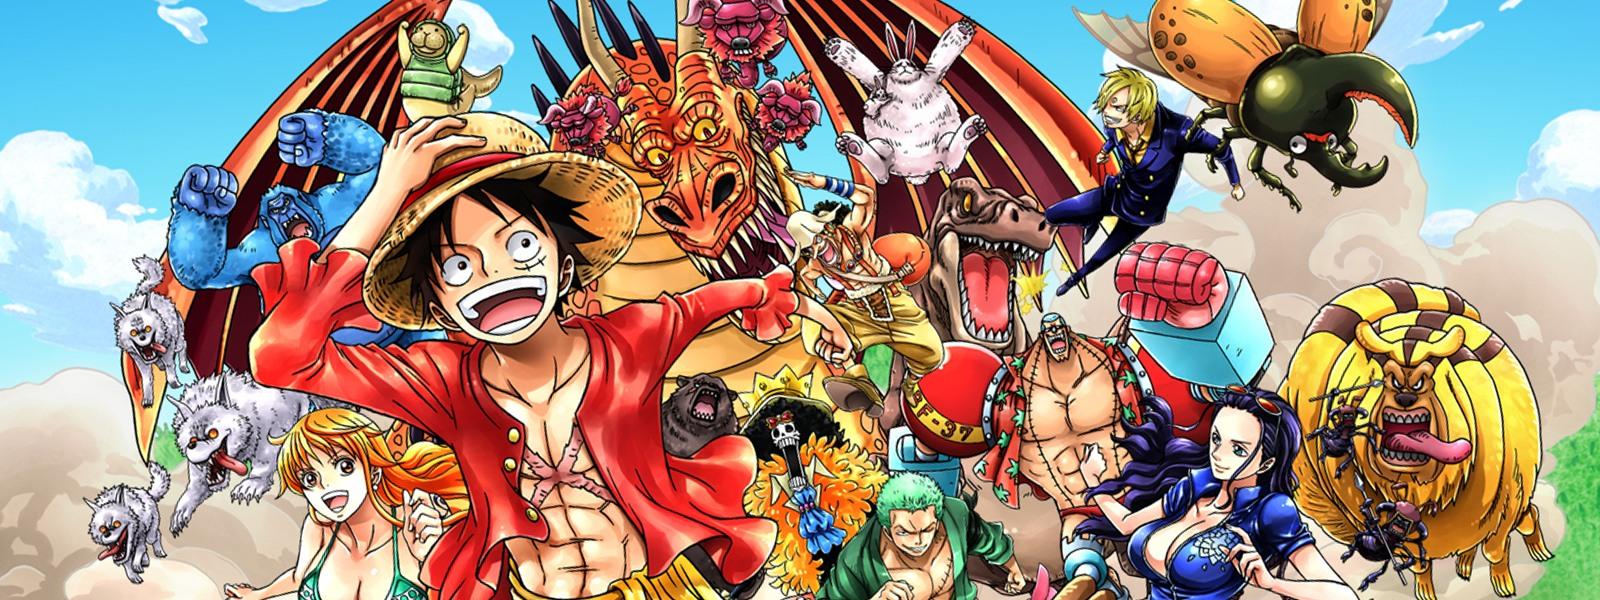 News  One Piece  Les épisodes inédits VF  GAMEONE